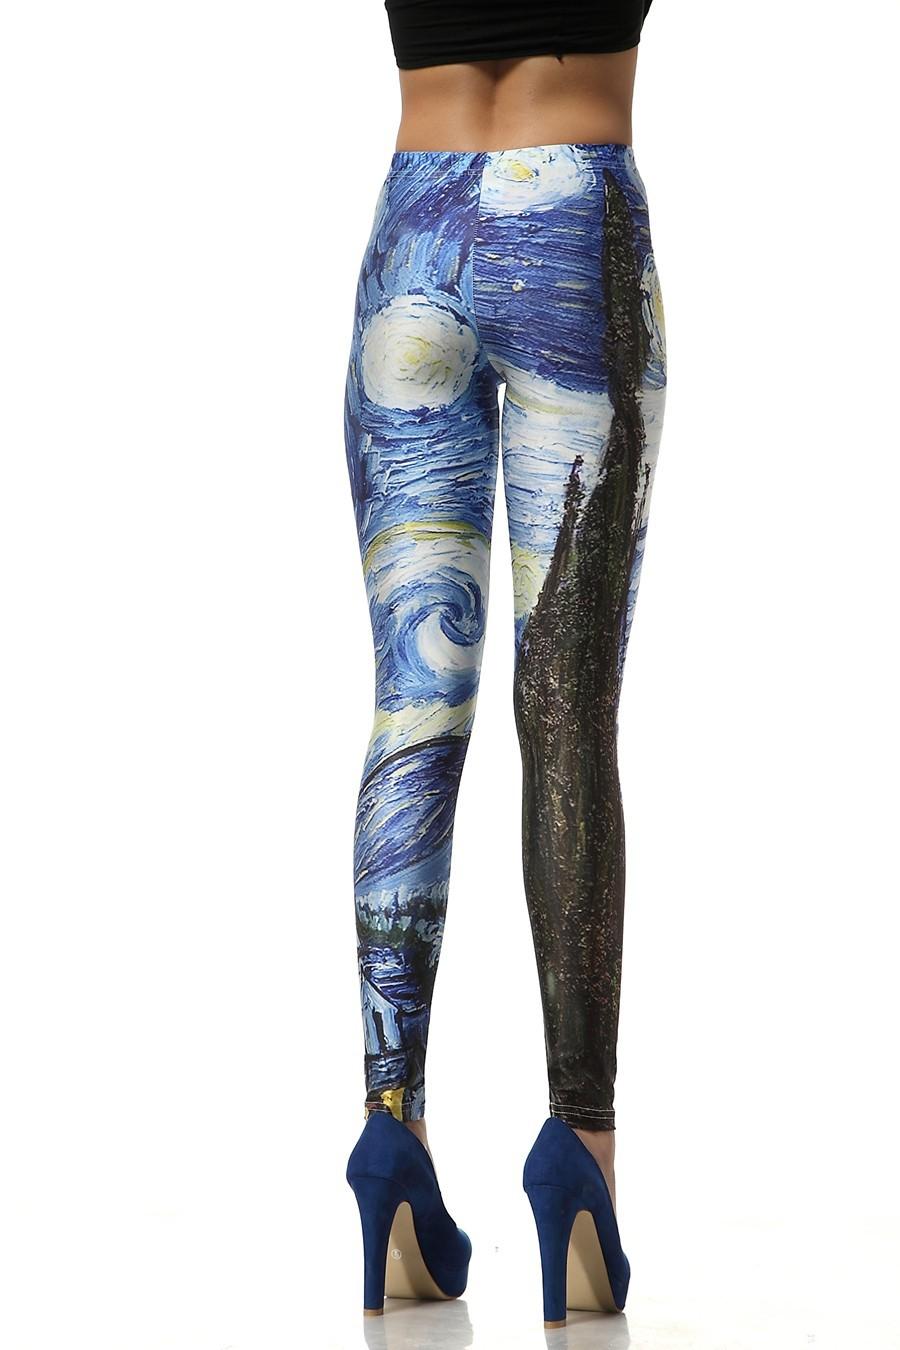 Gym Pants Womens Amazon